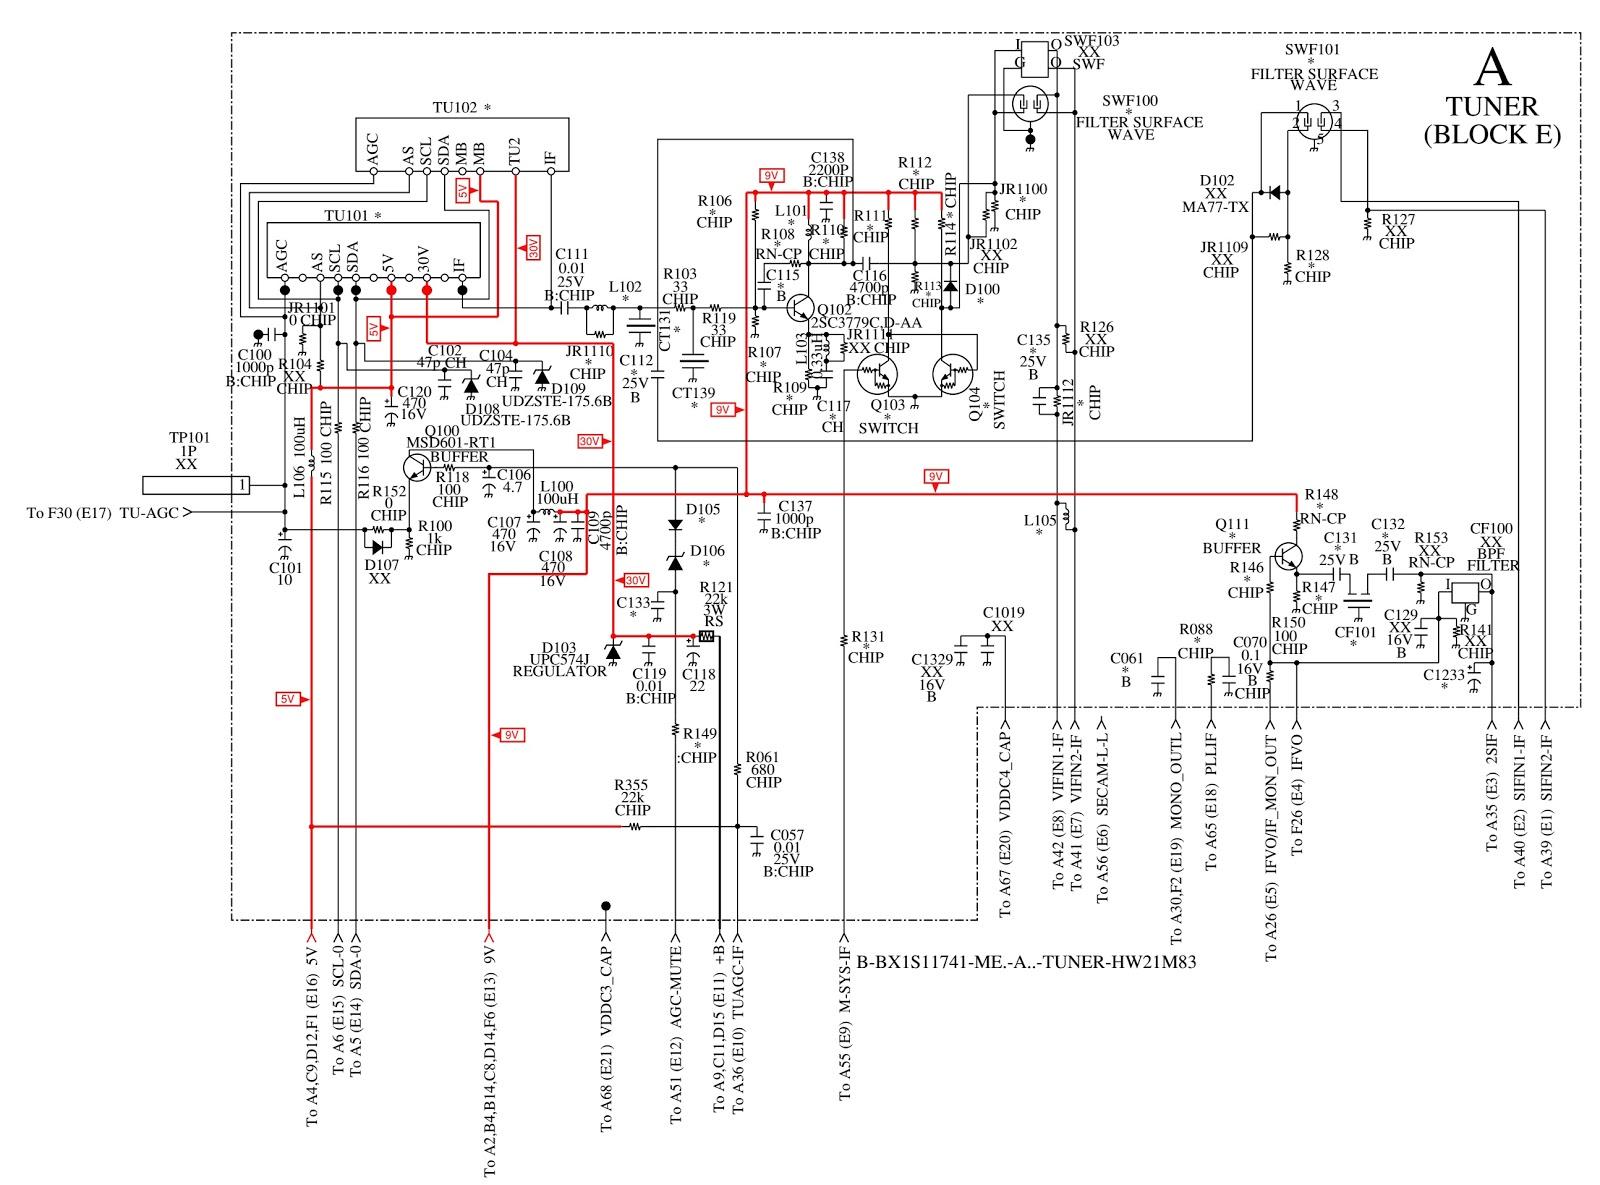 Electro Help  Kv Hw21m50  U2013 Sony Trinitron Crt Tv  U2013 Circuit Diagram